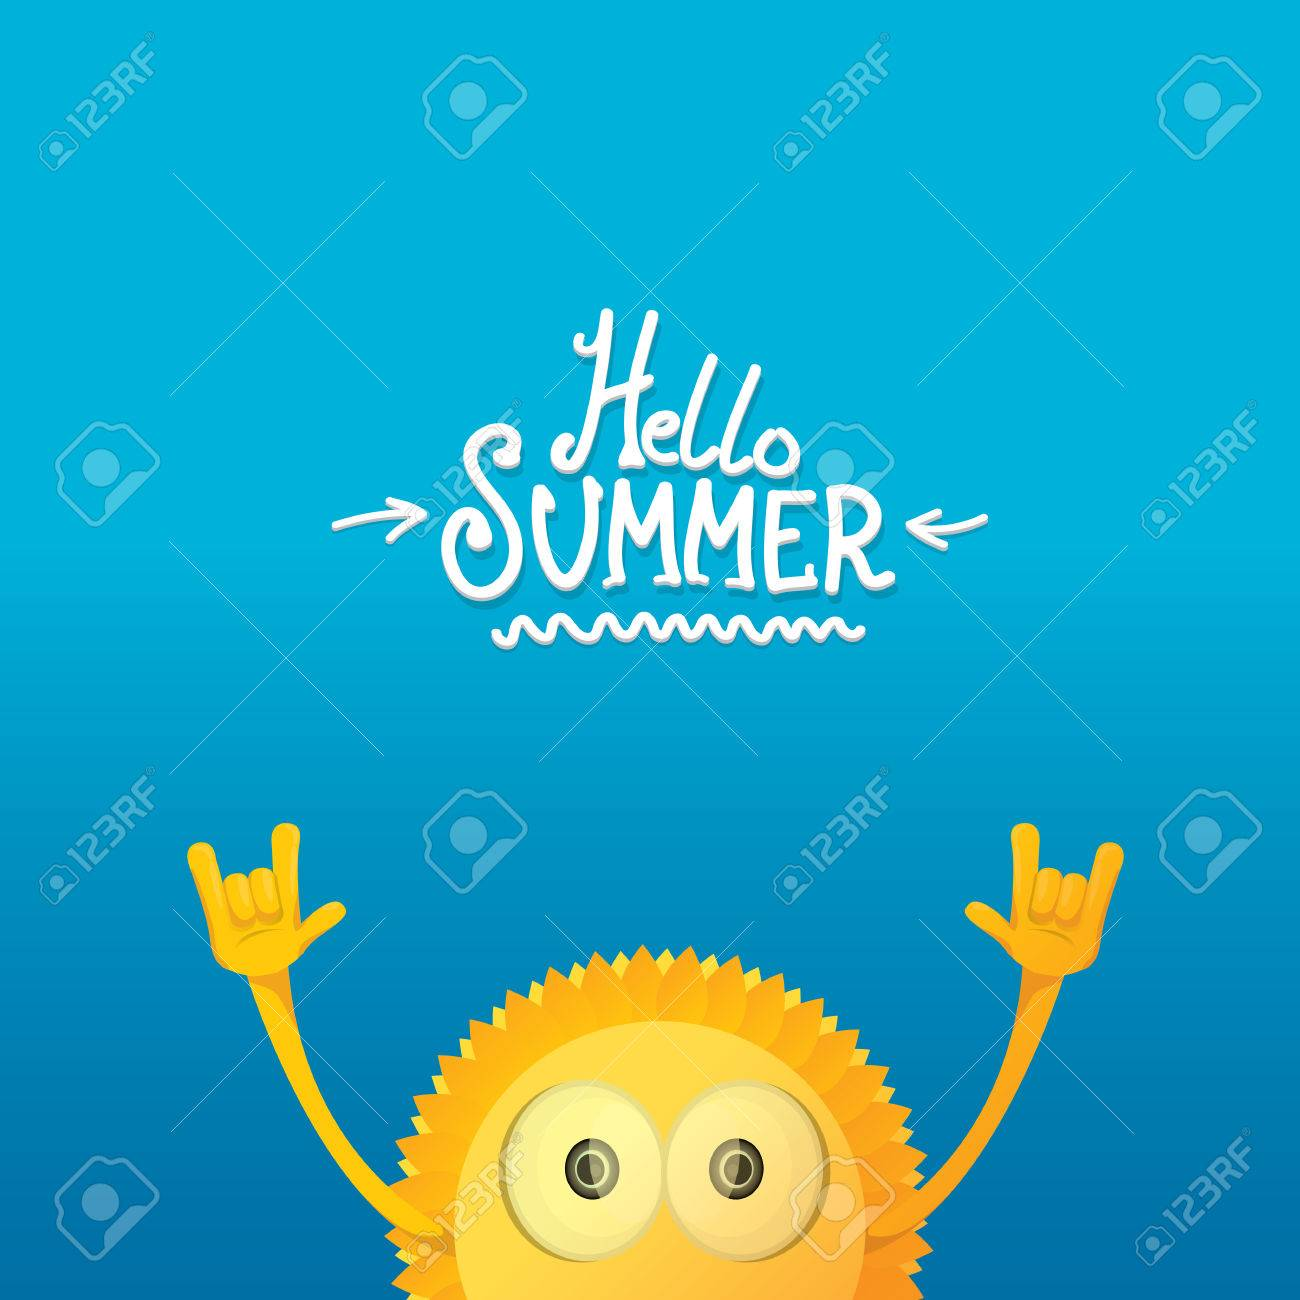 Rock n roll poster design - Vector Hello Summer Rock N Roll Poster Summer Party Design Template